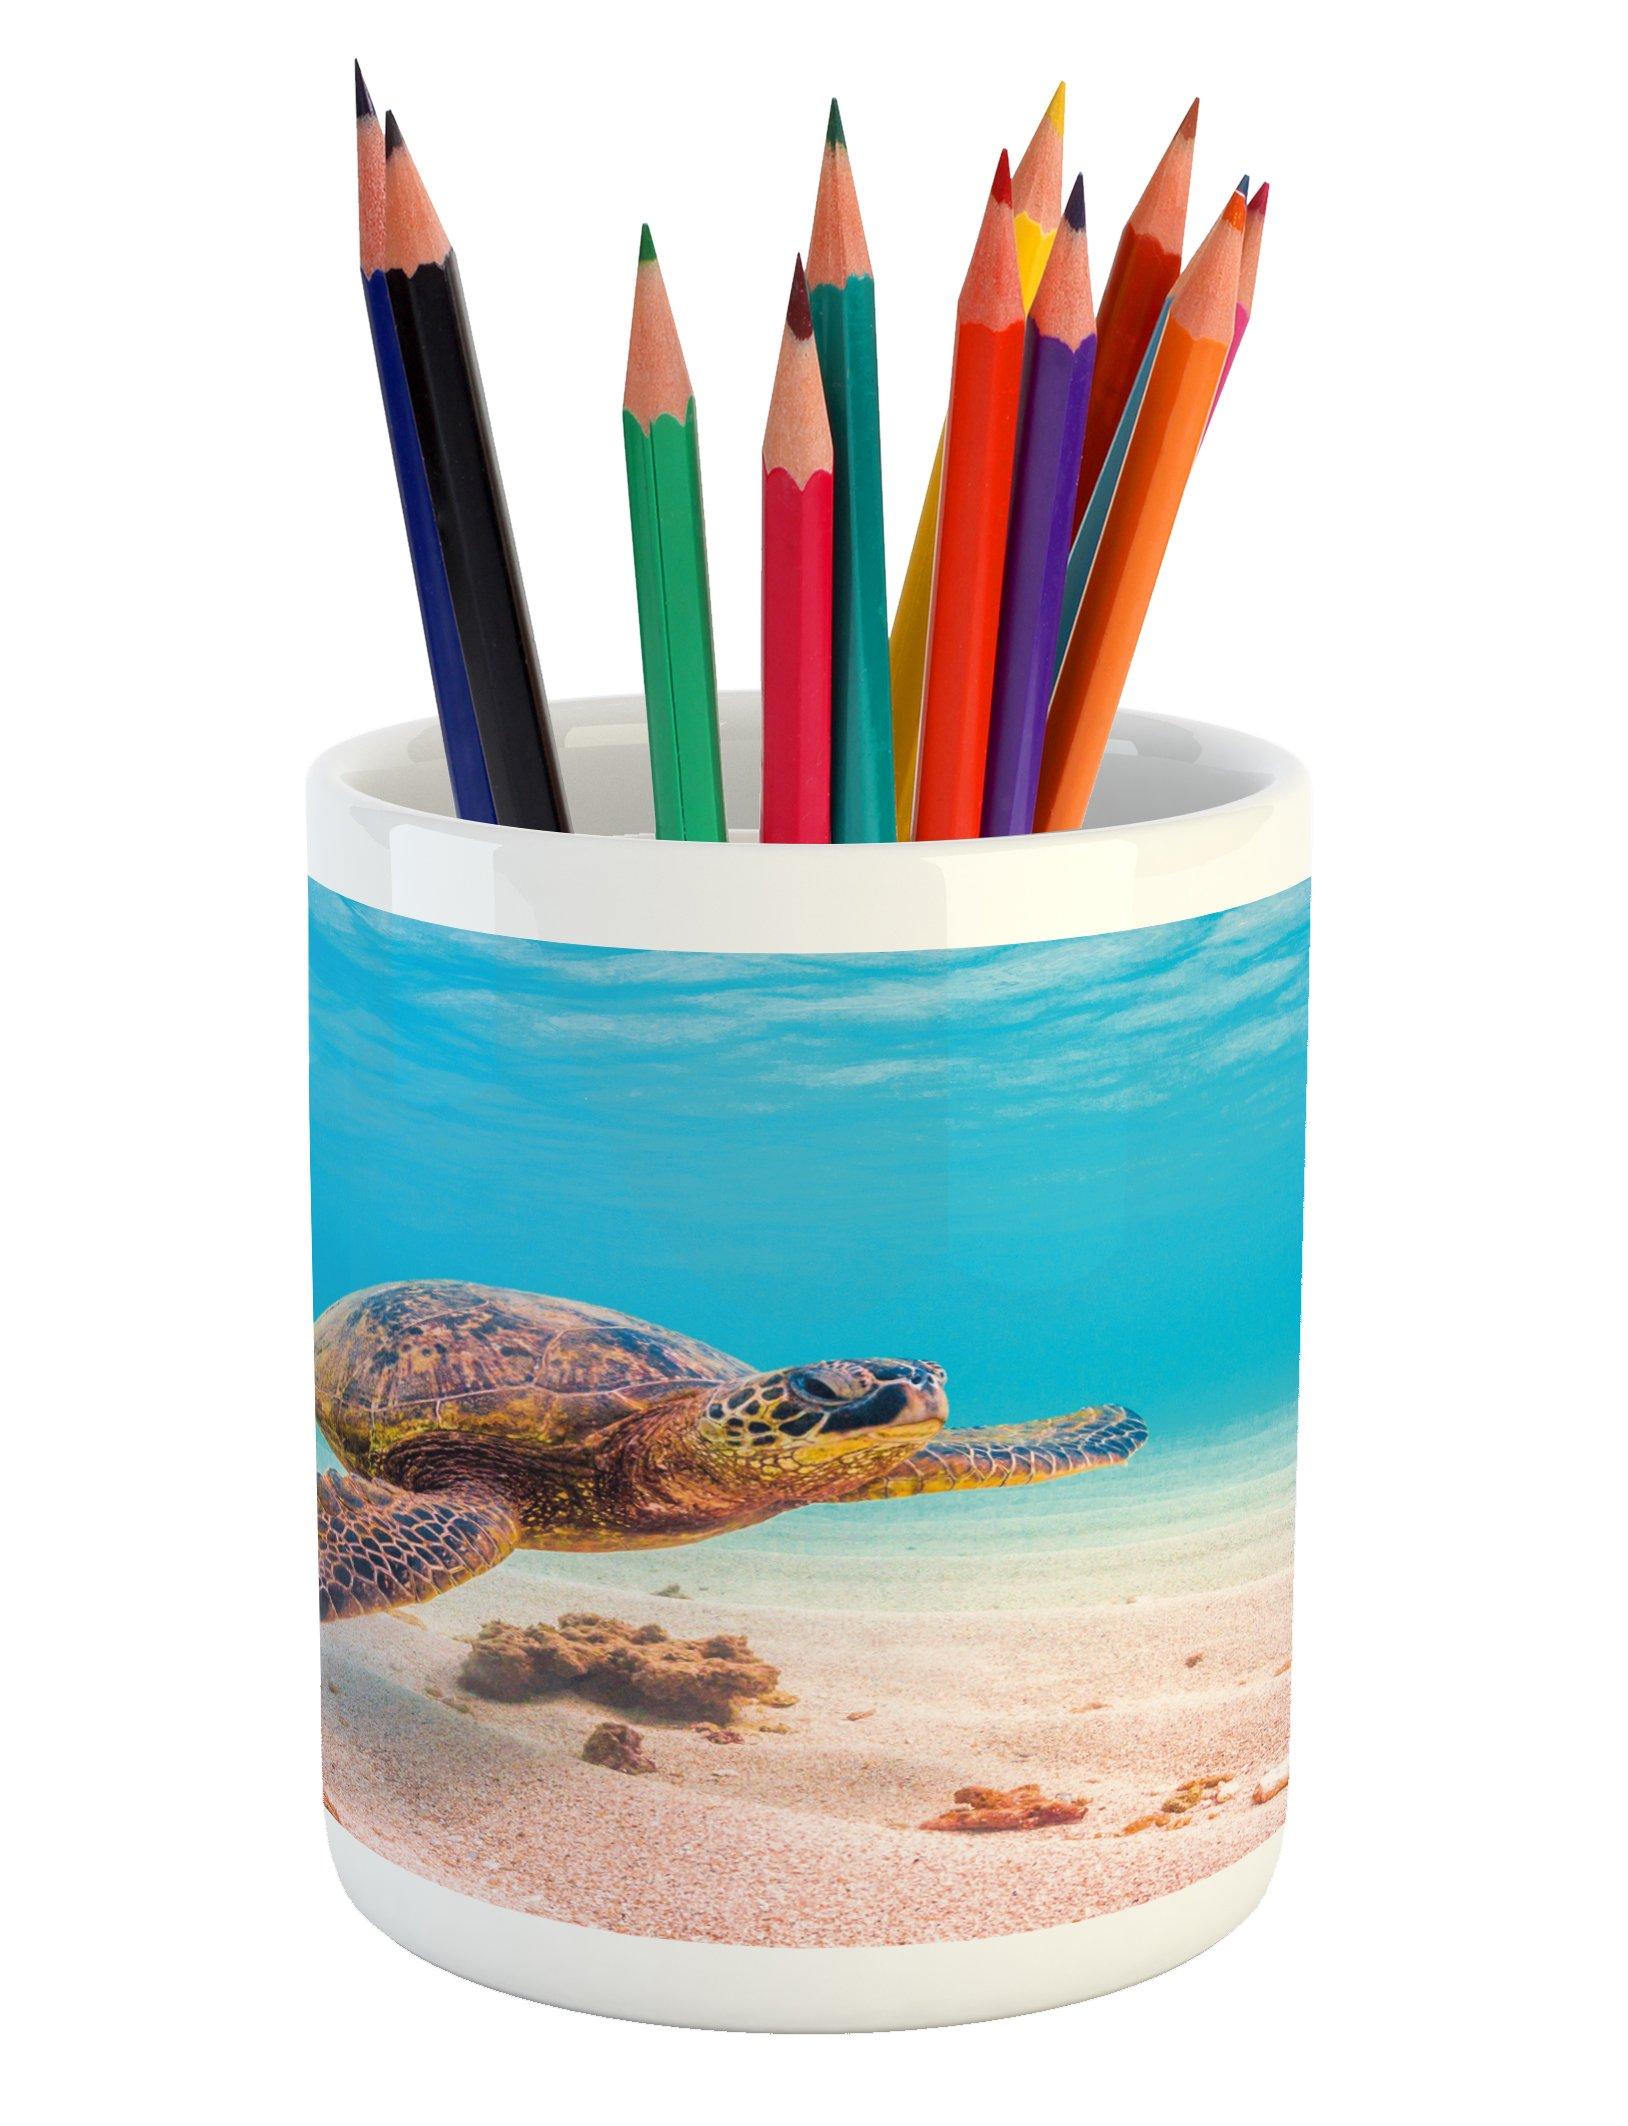 Ambesonne Turtle Pencil Pen Holder, Hawaiian Green Sea Turtle Cruises in Warm Waters of The Pacific Ocean Photo, Printed Ceramic Pencil Pen Holder for Desk Office Accessory, Aqua Cinnamon Brown